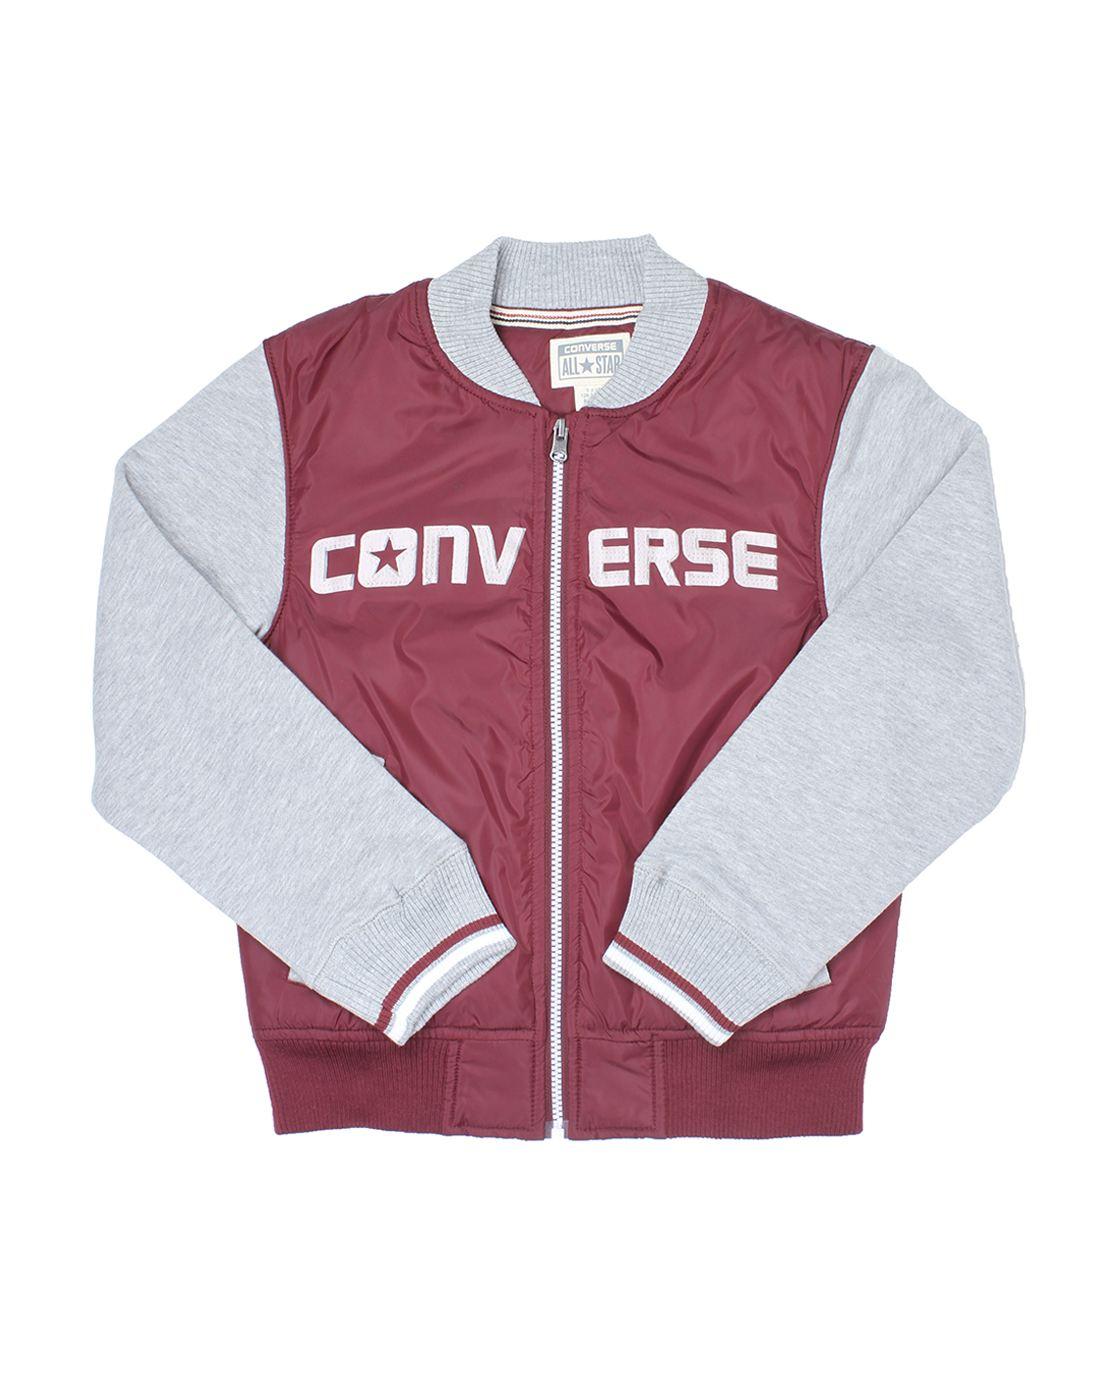 Converse Boys Maroon Sweatshirt